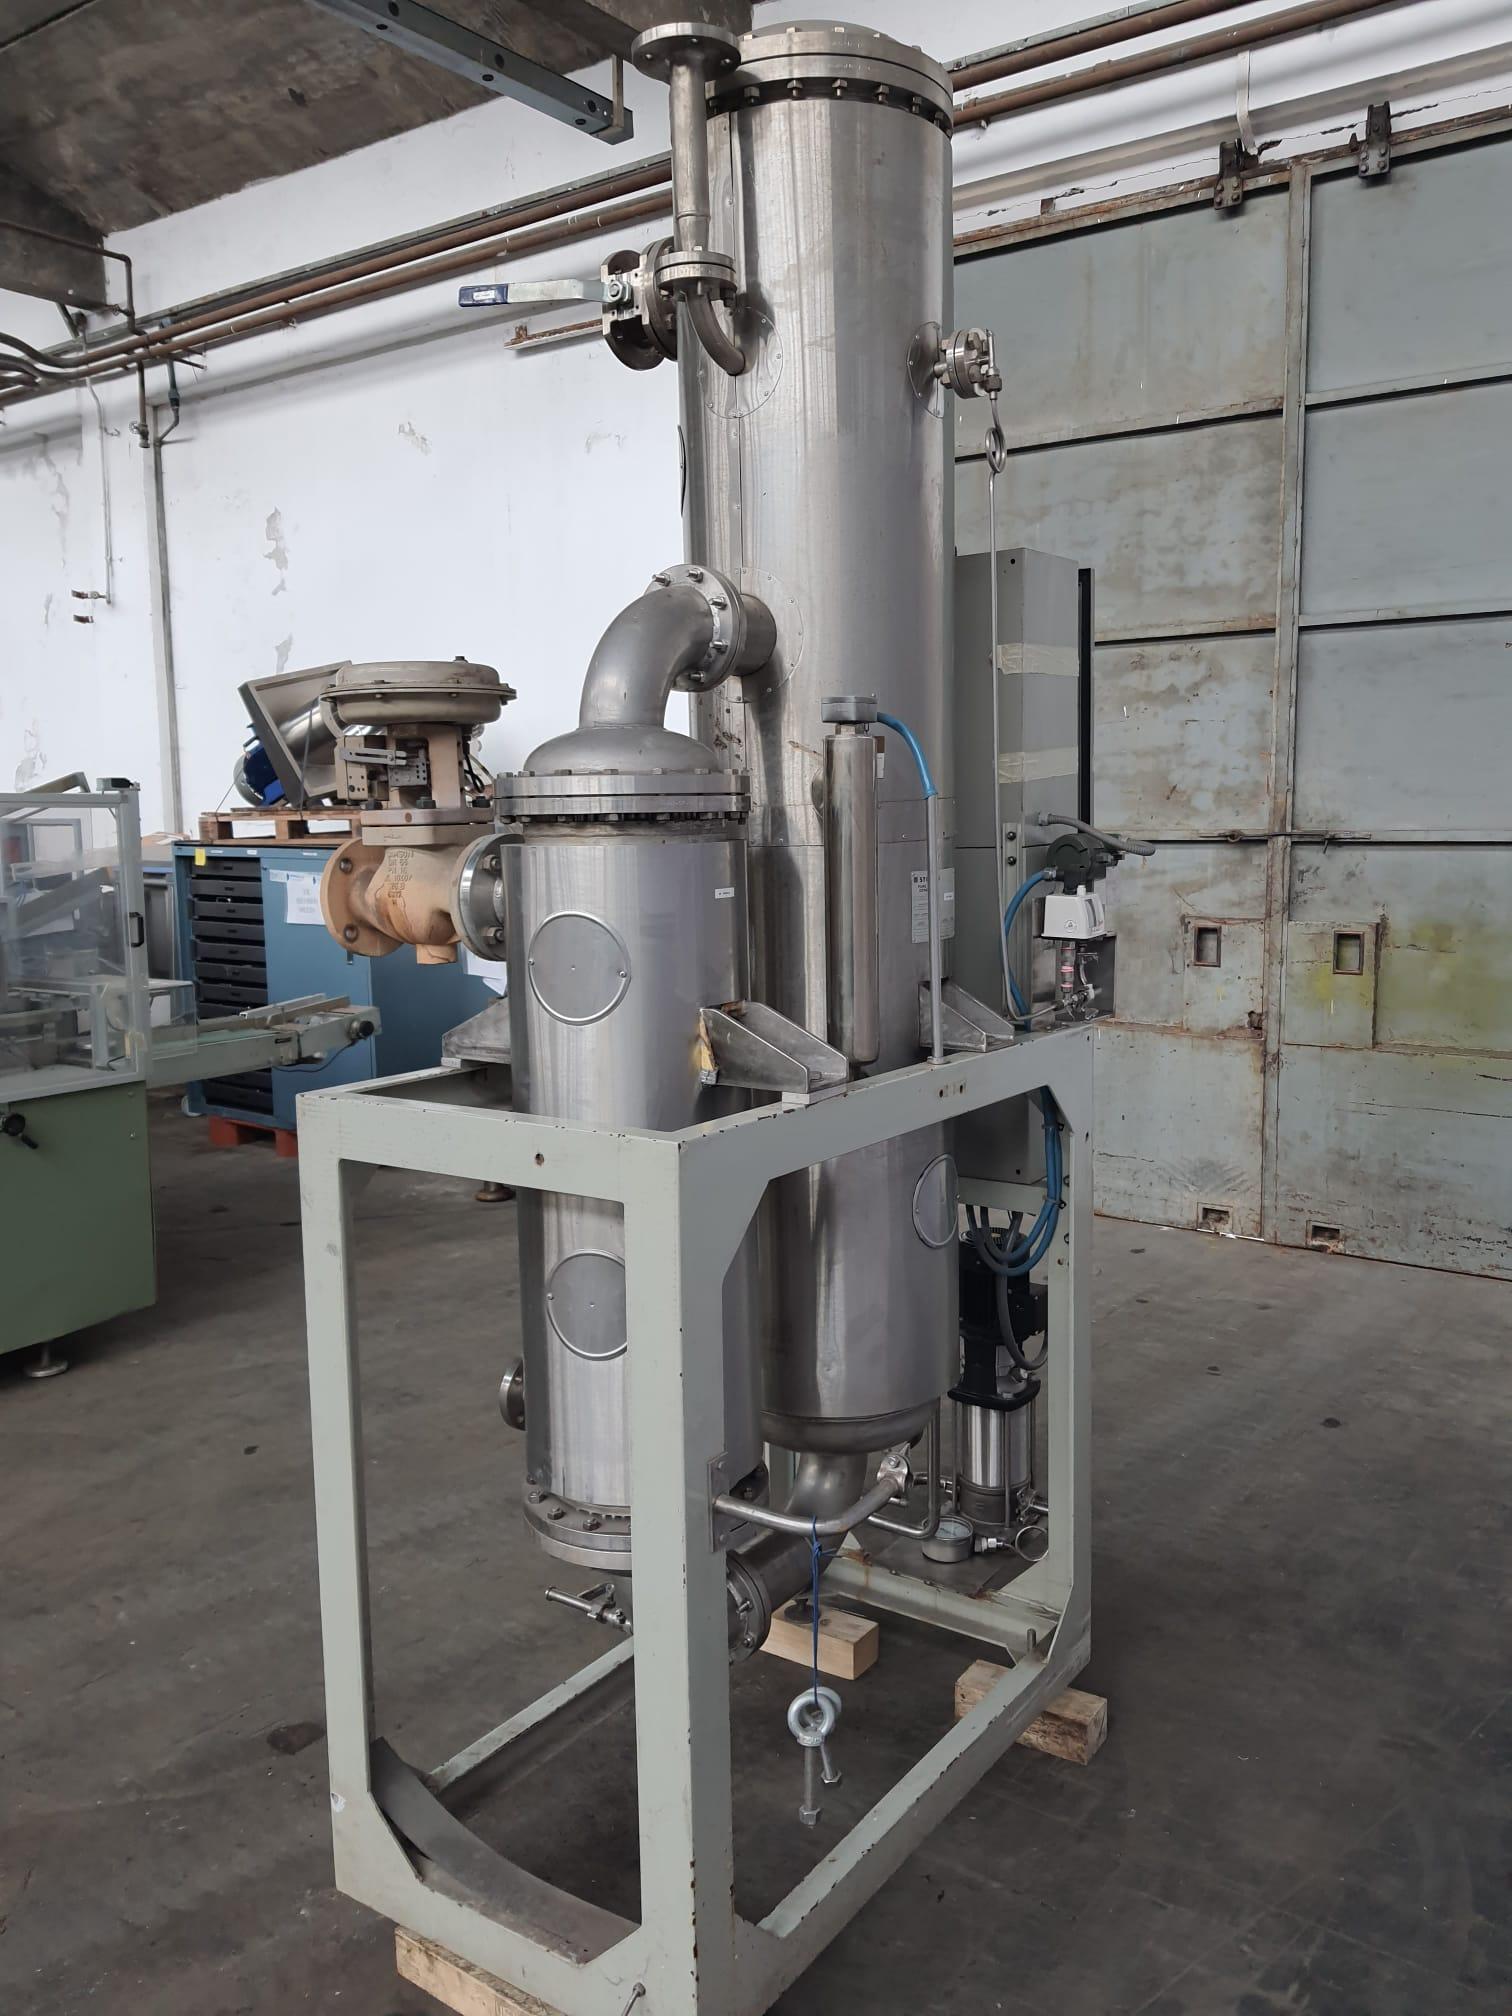 STILMAS Water Treatment/Distillation Units/Reverse Osmosis/Pure Steam Generators STILMAS PSG 500 DTS -  ER020 A